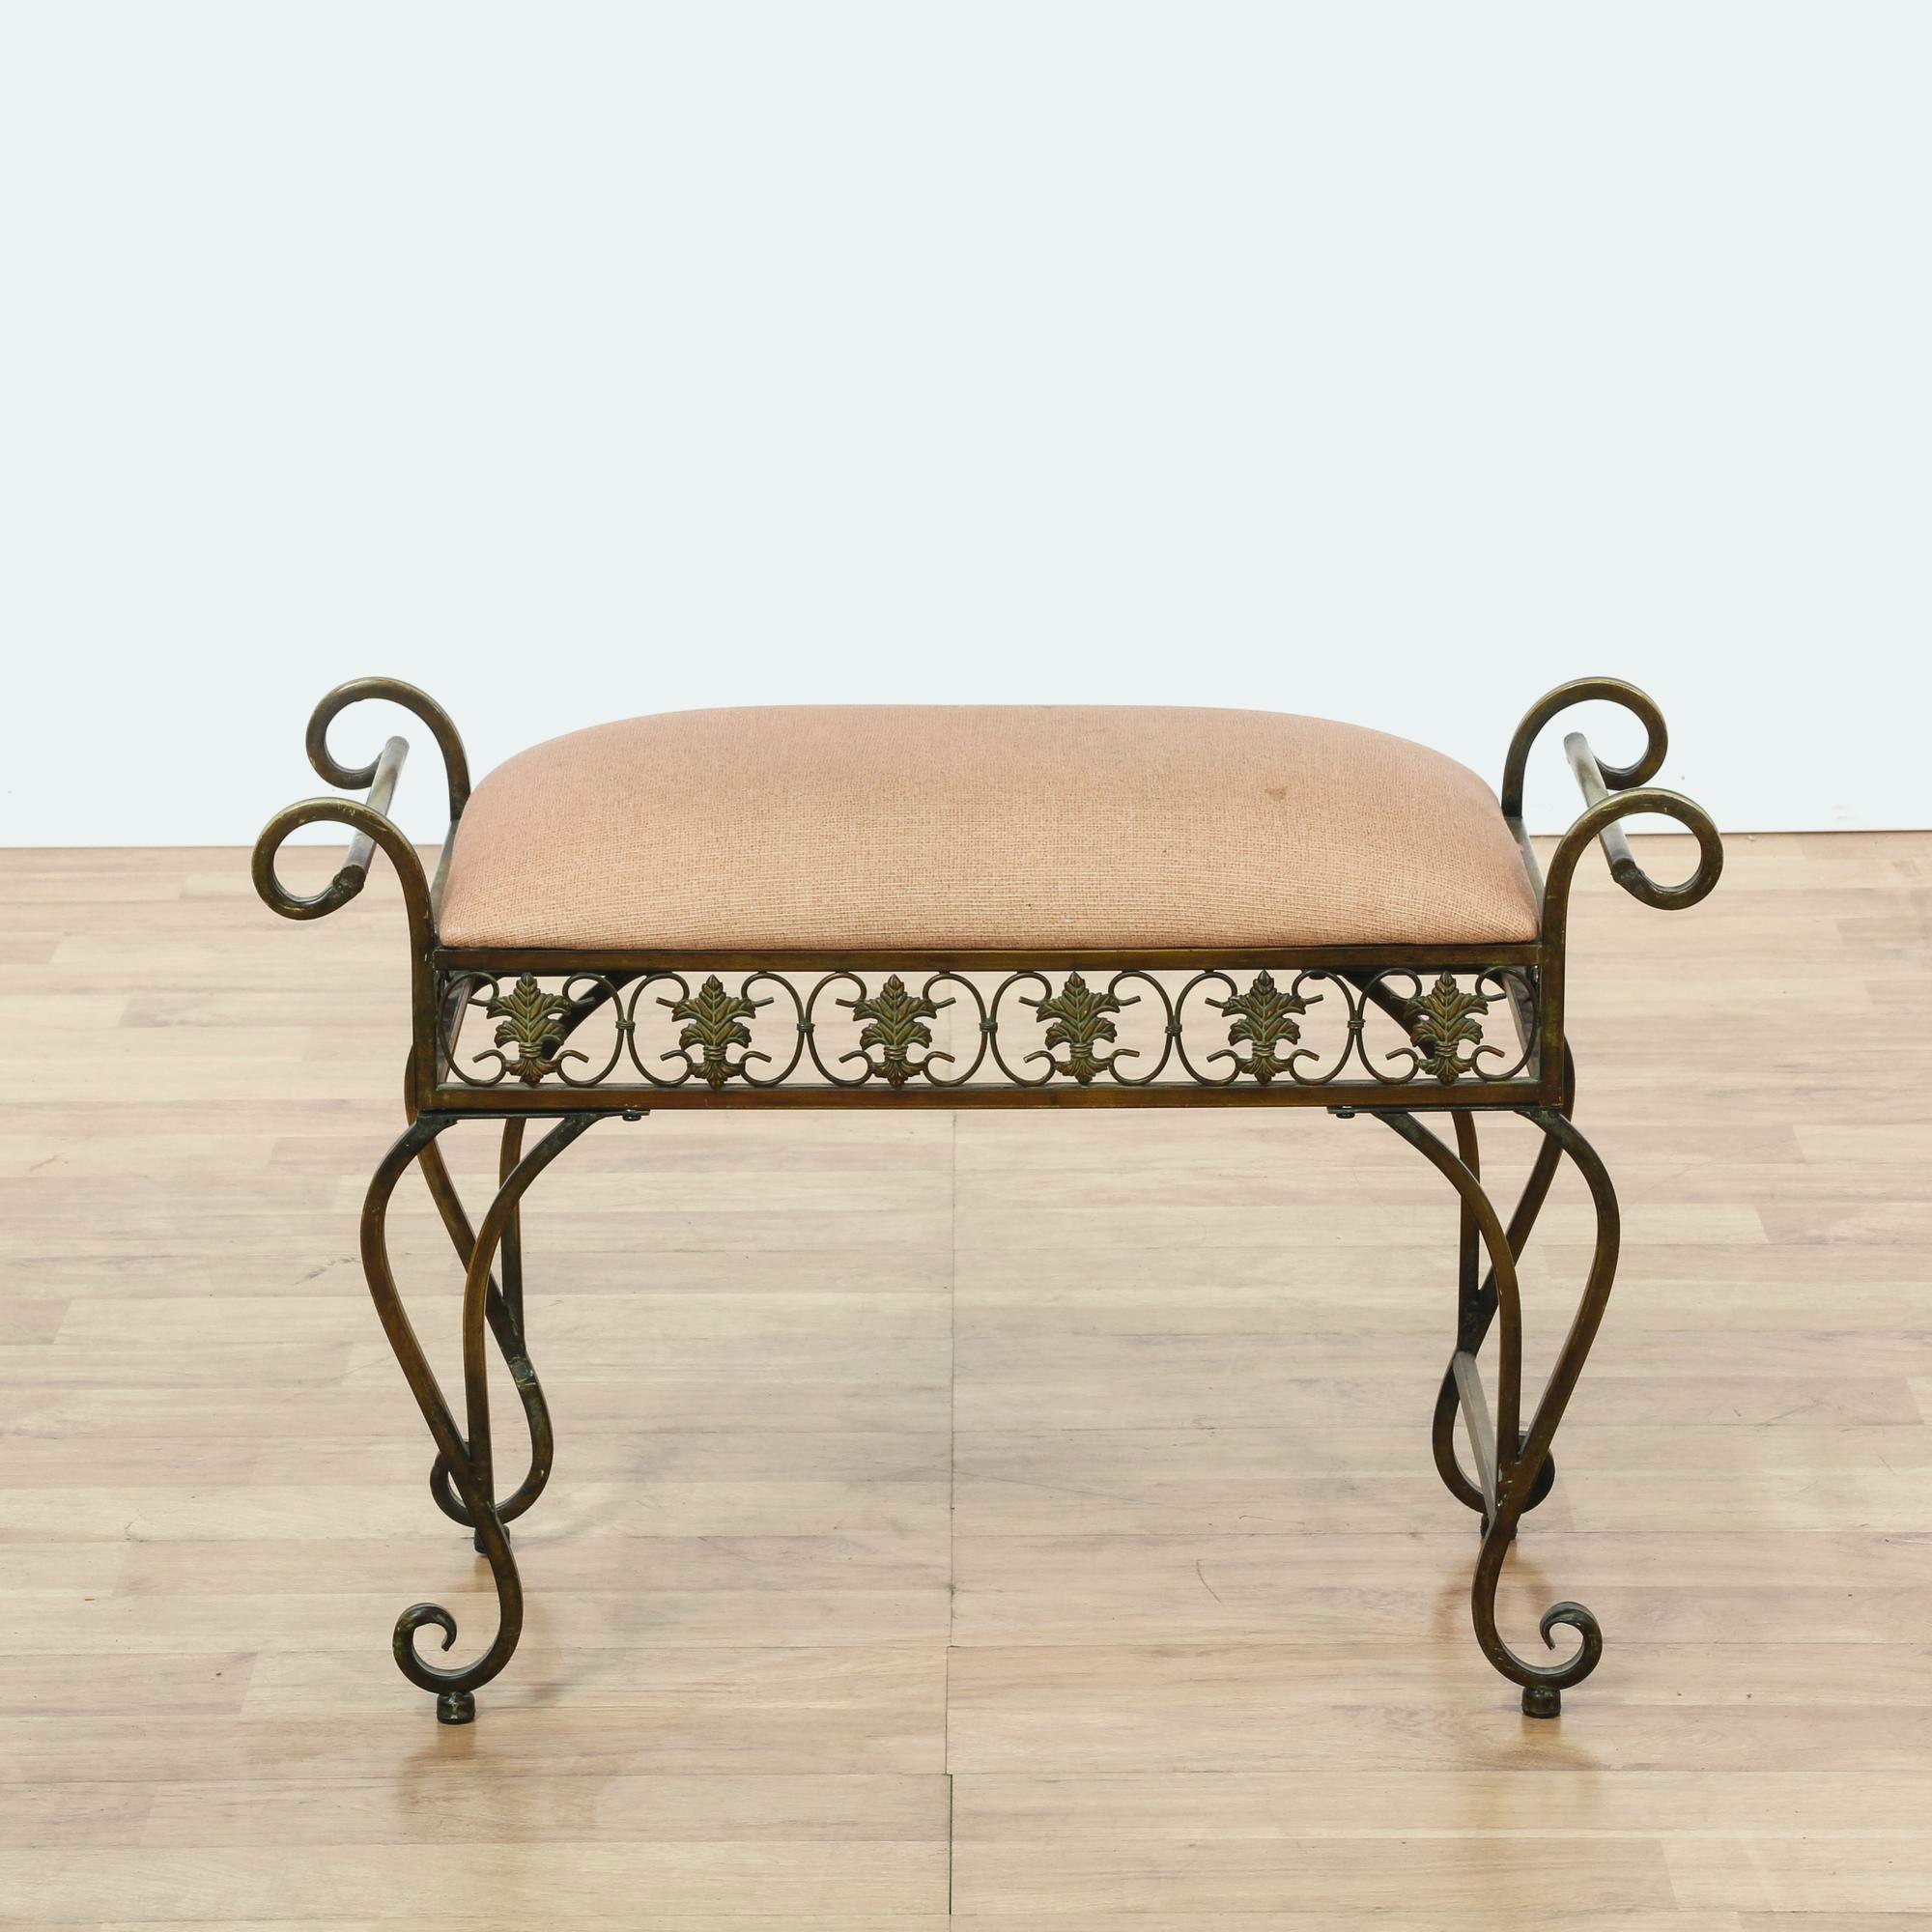 Chaise De Jardin Super U Impressionnant Photos Super U Table De Jardin Ainsi Que Vieux Table De Jardin Aluminium